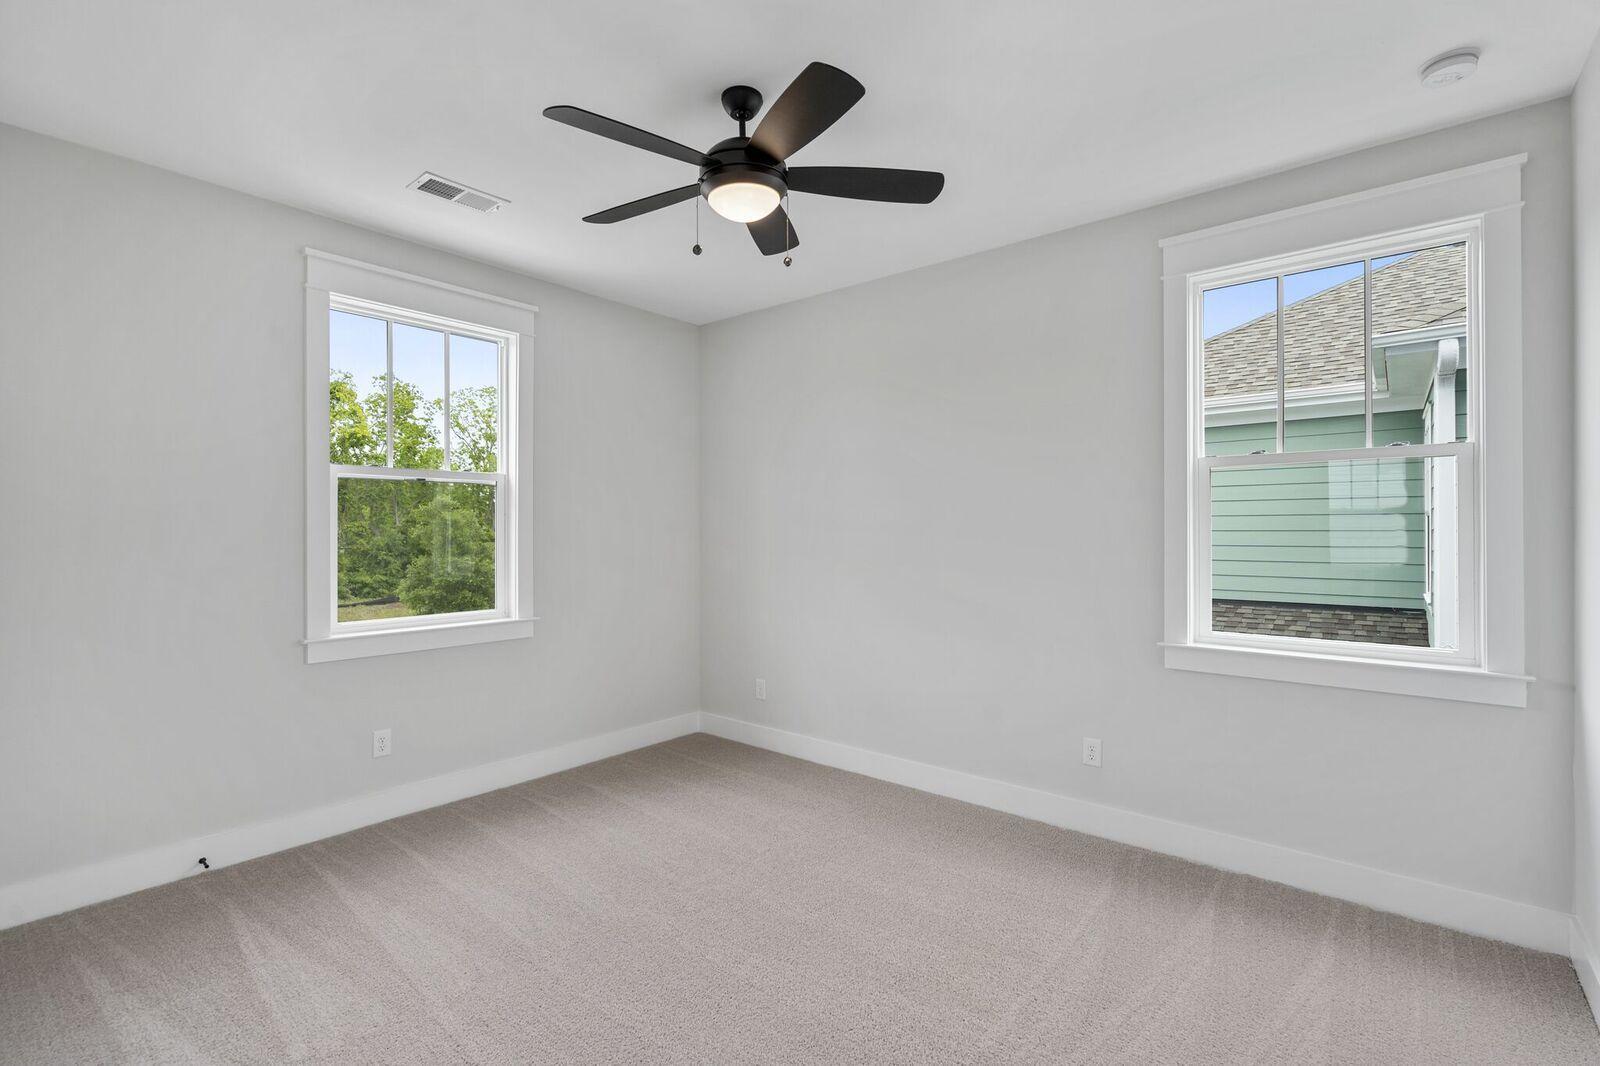 Midtown Homes For Sale - 1533 Kepley, Mount Pleasant, SC - 49